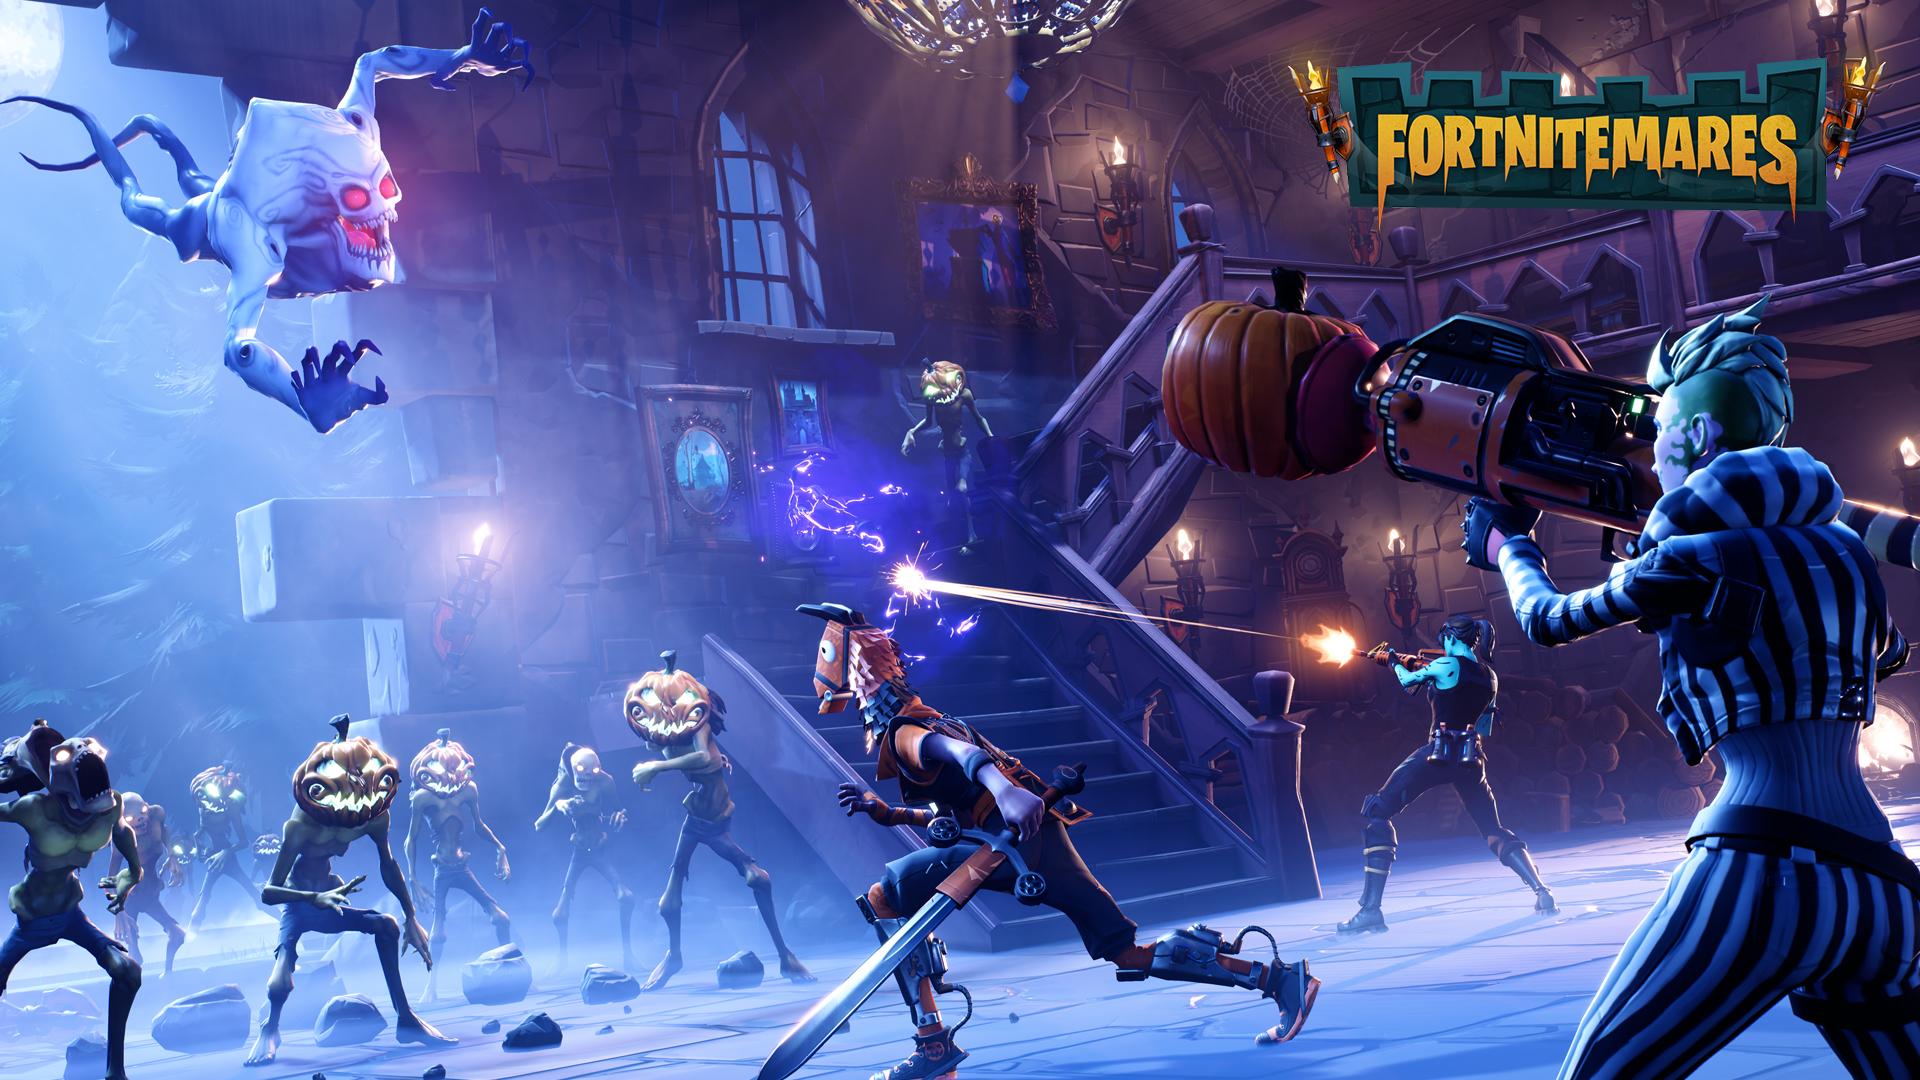 Free Download Epic Games Fortnite 1920x1080 For Your Desktop